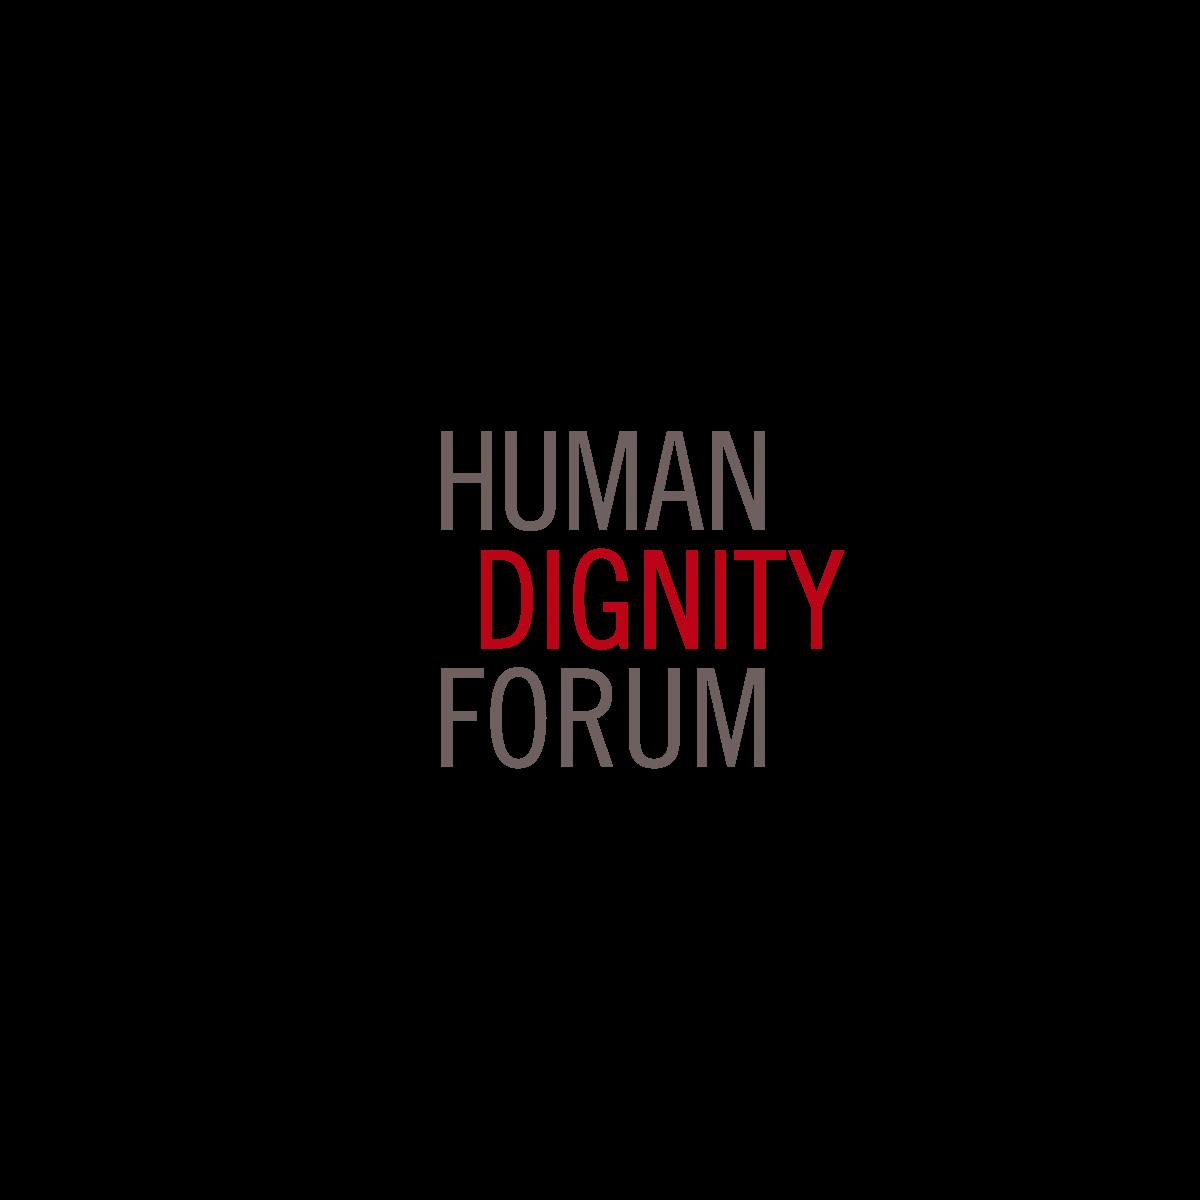 Human Dignity Forum Logo